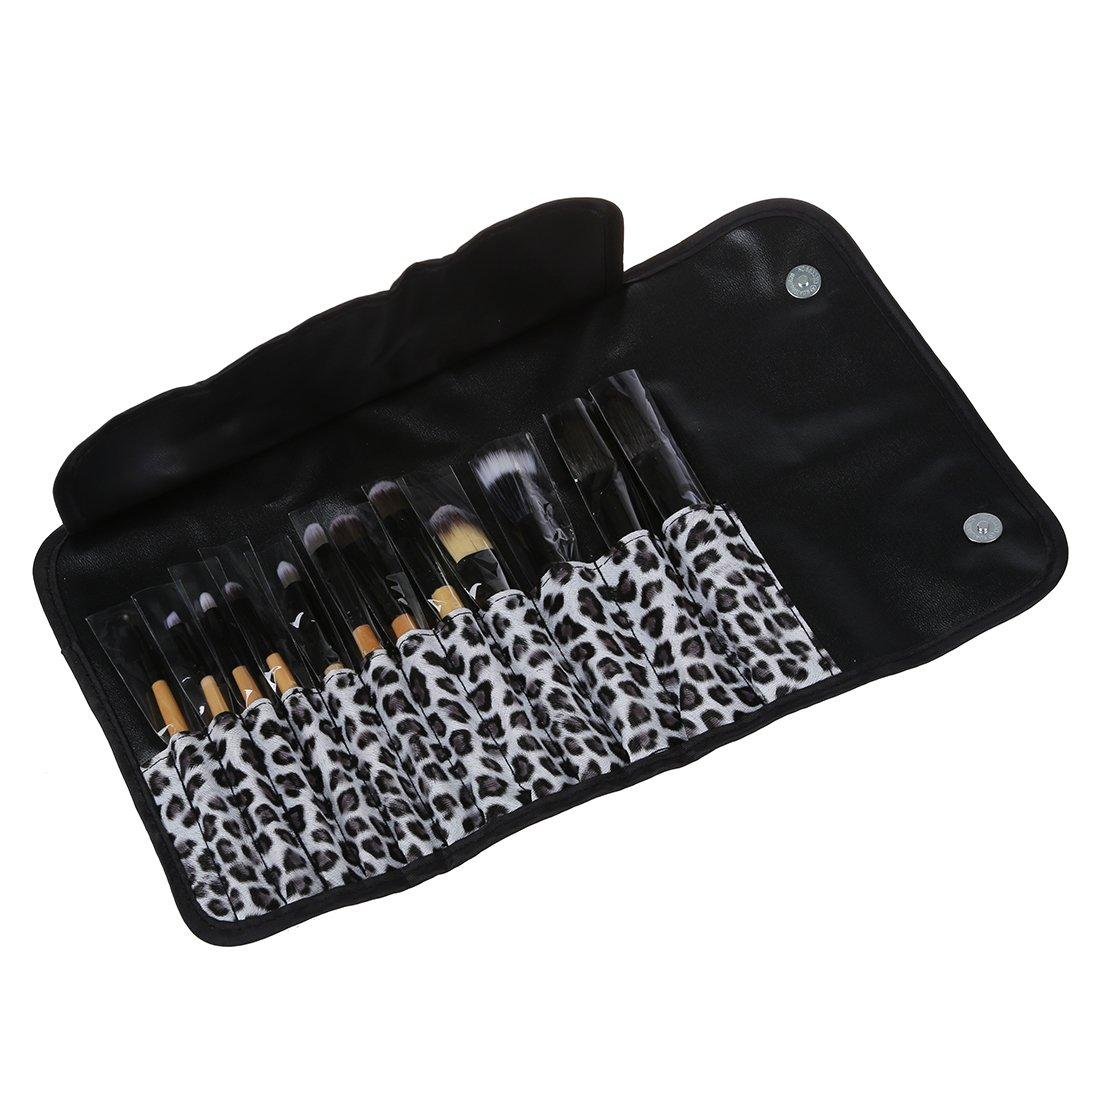 SODIAL(R) 12 PCS Makeup Cosmetic Toiletry Eyeshadow Powder Brush Set Kit+Case 019157